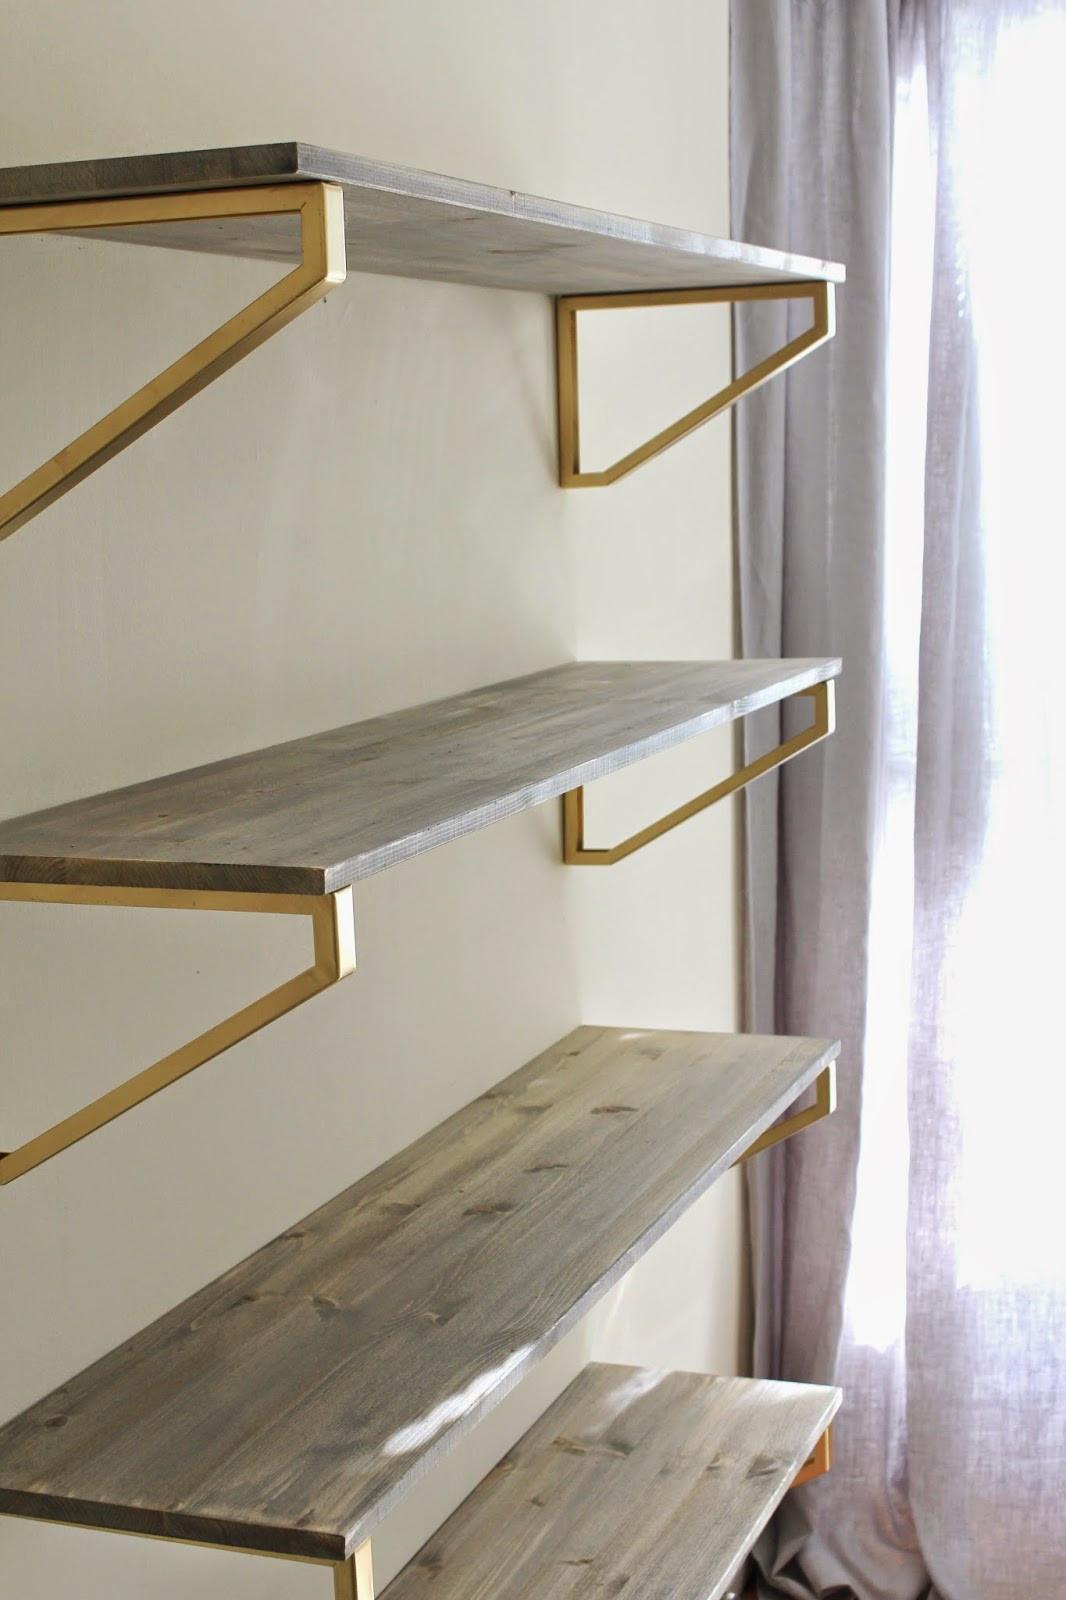 Best ideas about DIY Shelf Brackets . Save or Pin Cup Half Full Rustic Wood Shelf DIY Now.